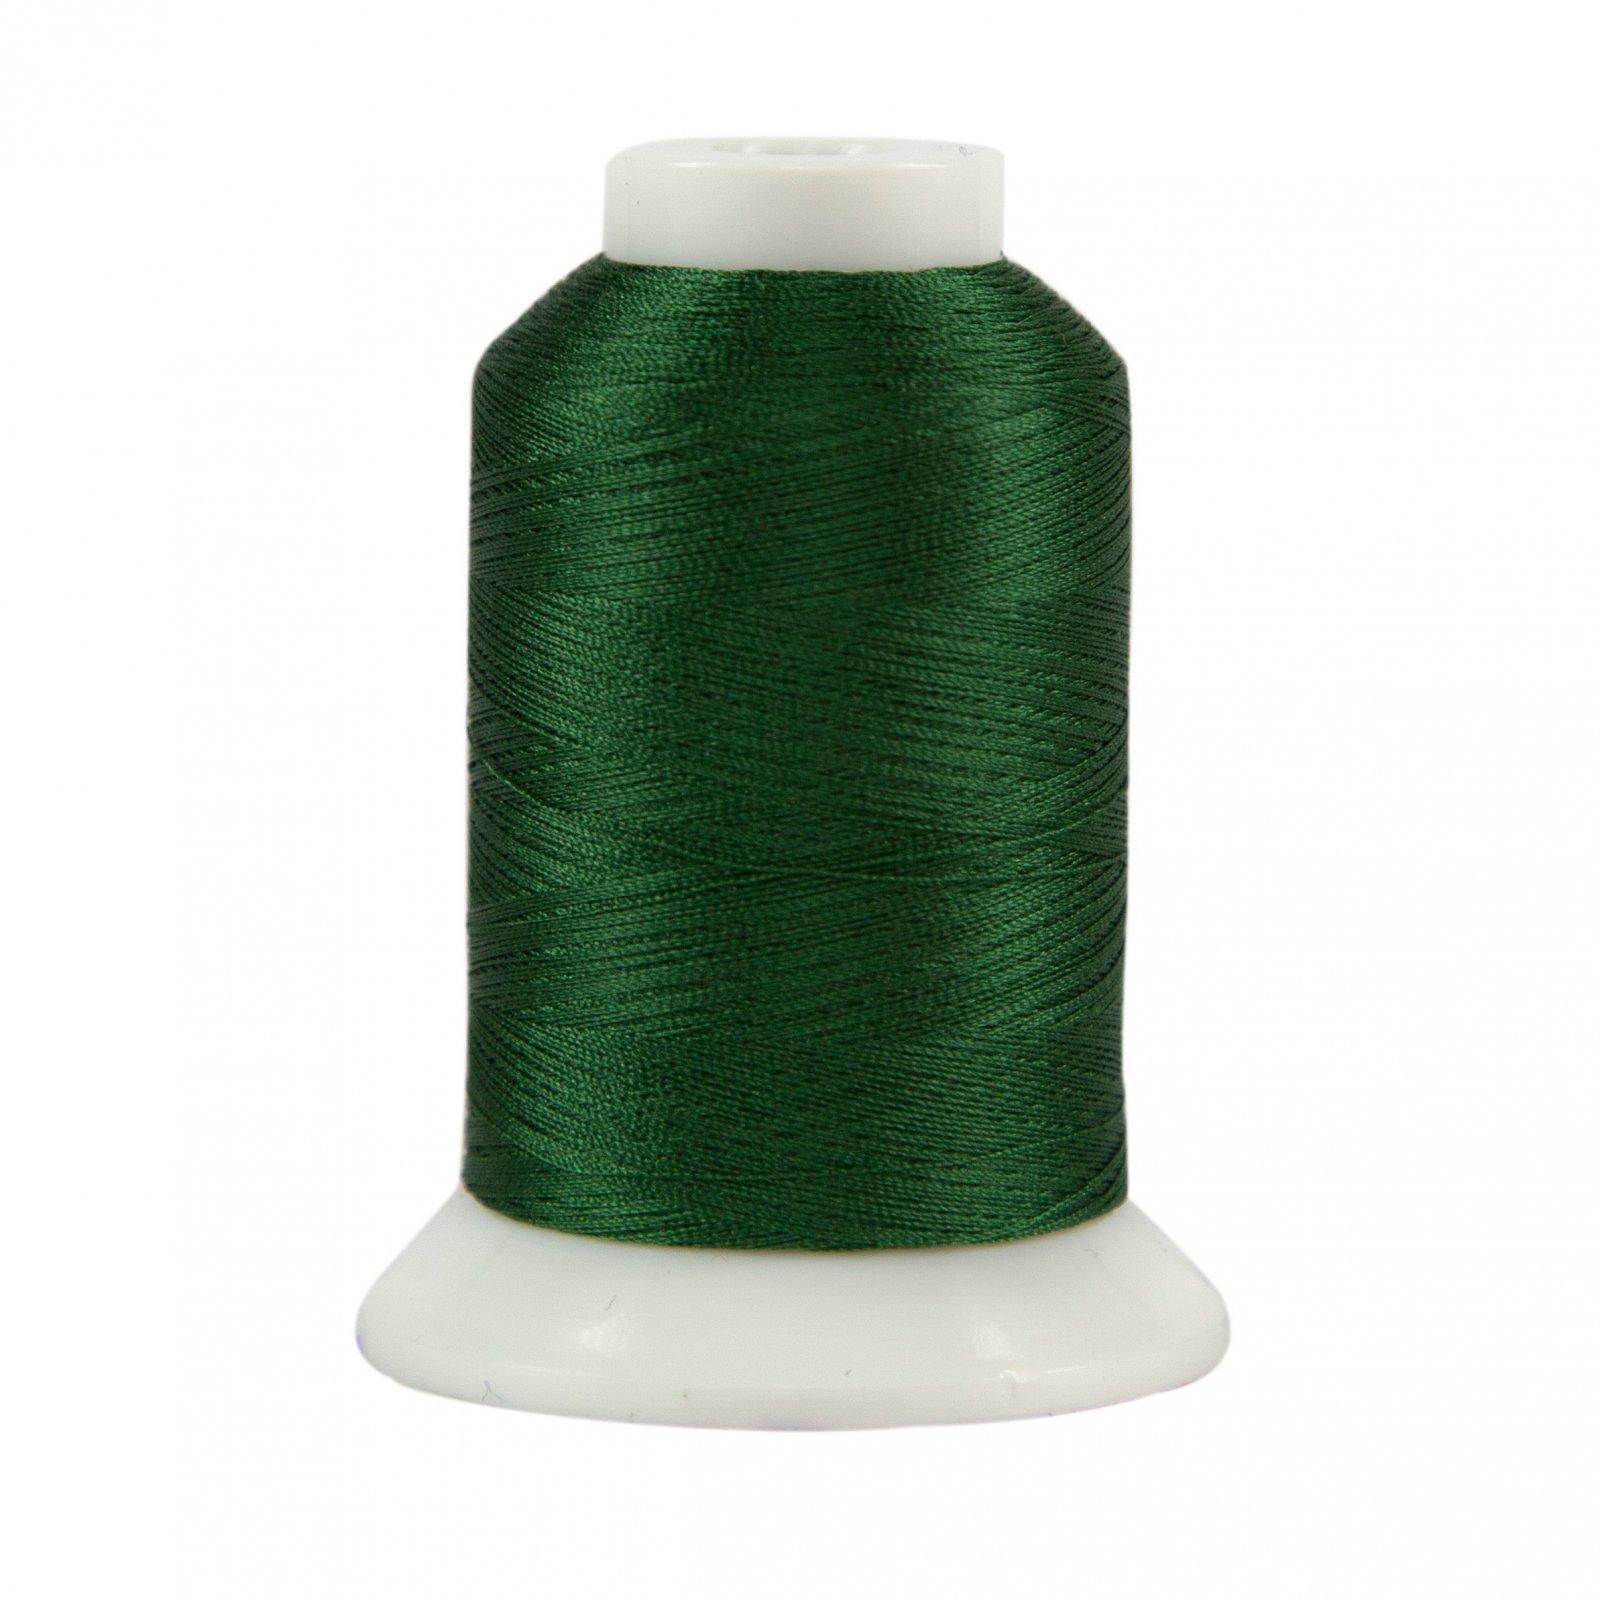 Kimono Silk Thread 100wt 1090yd Midori